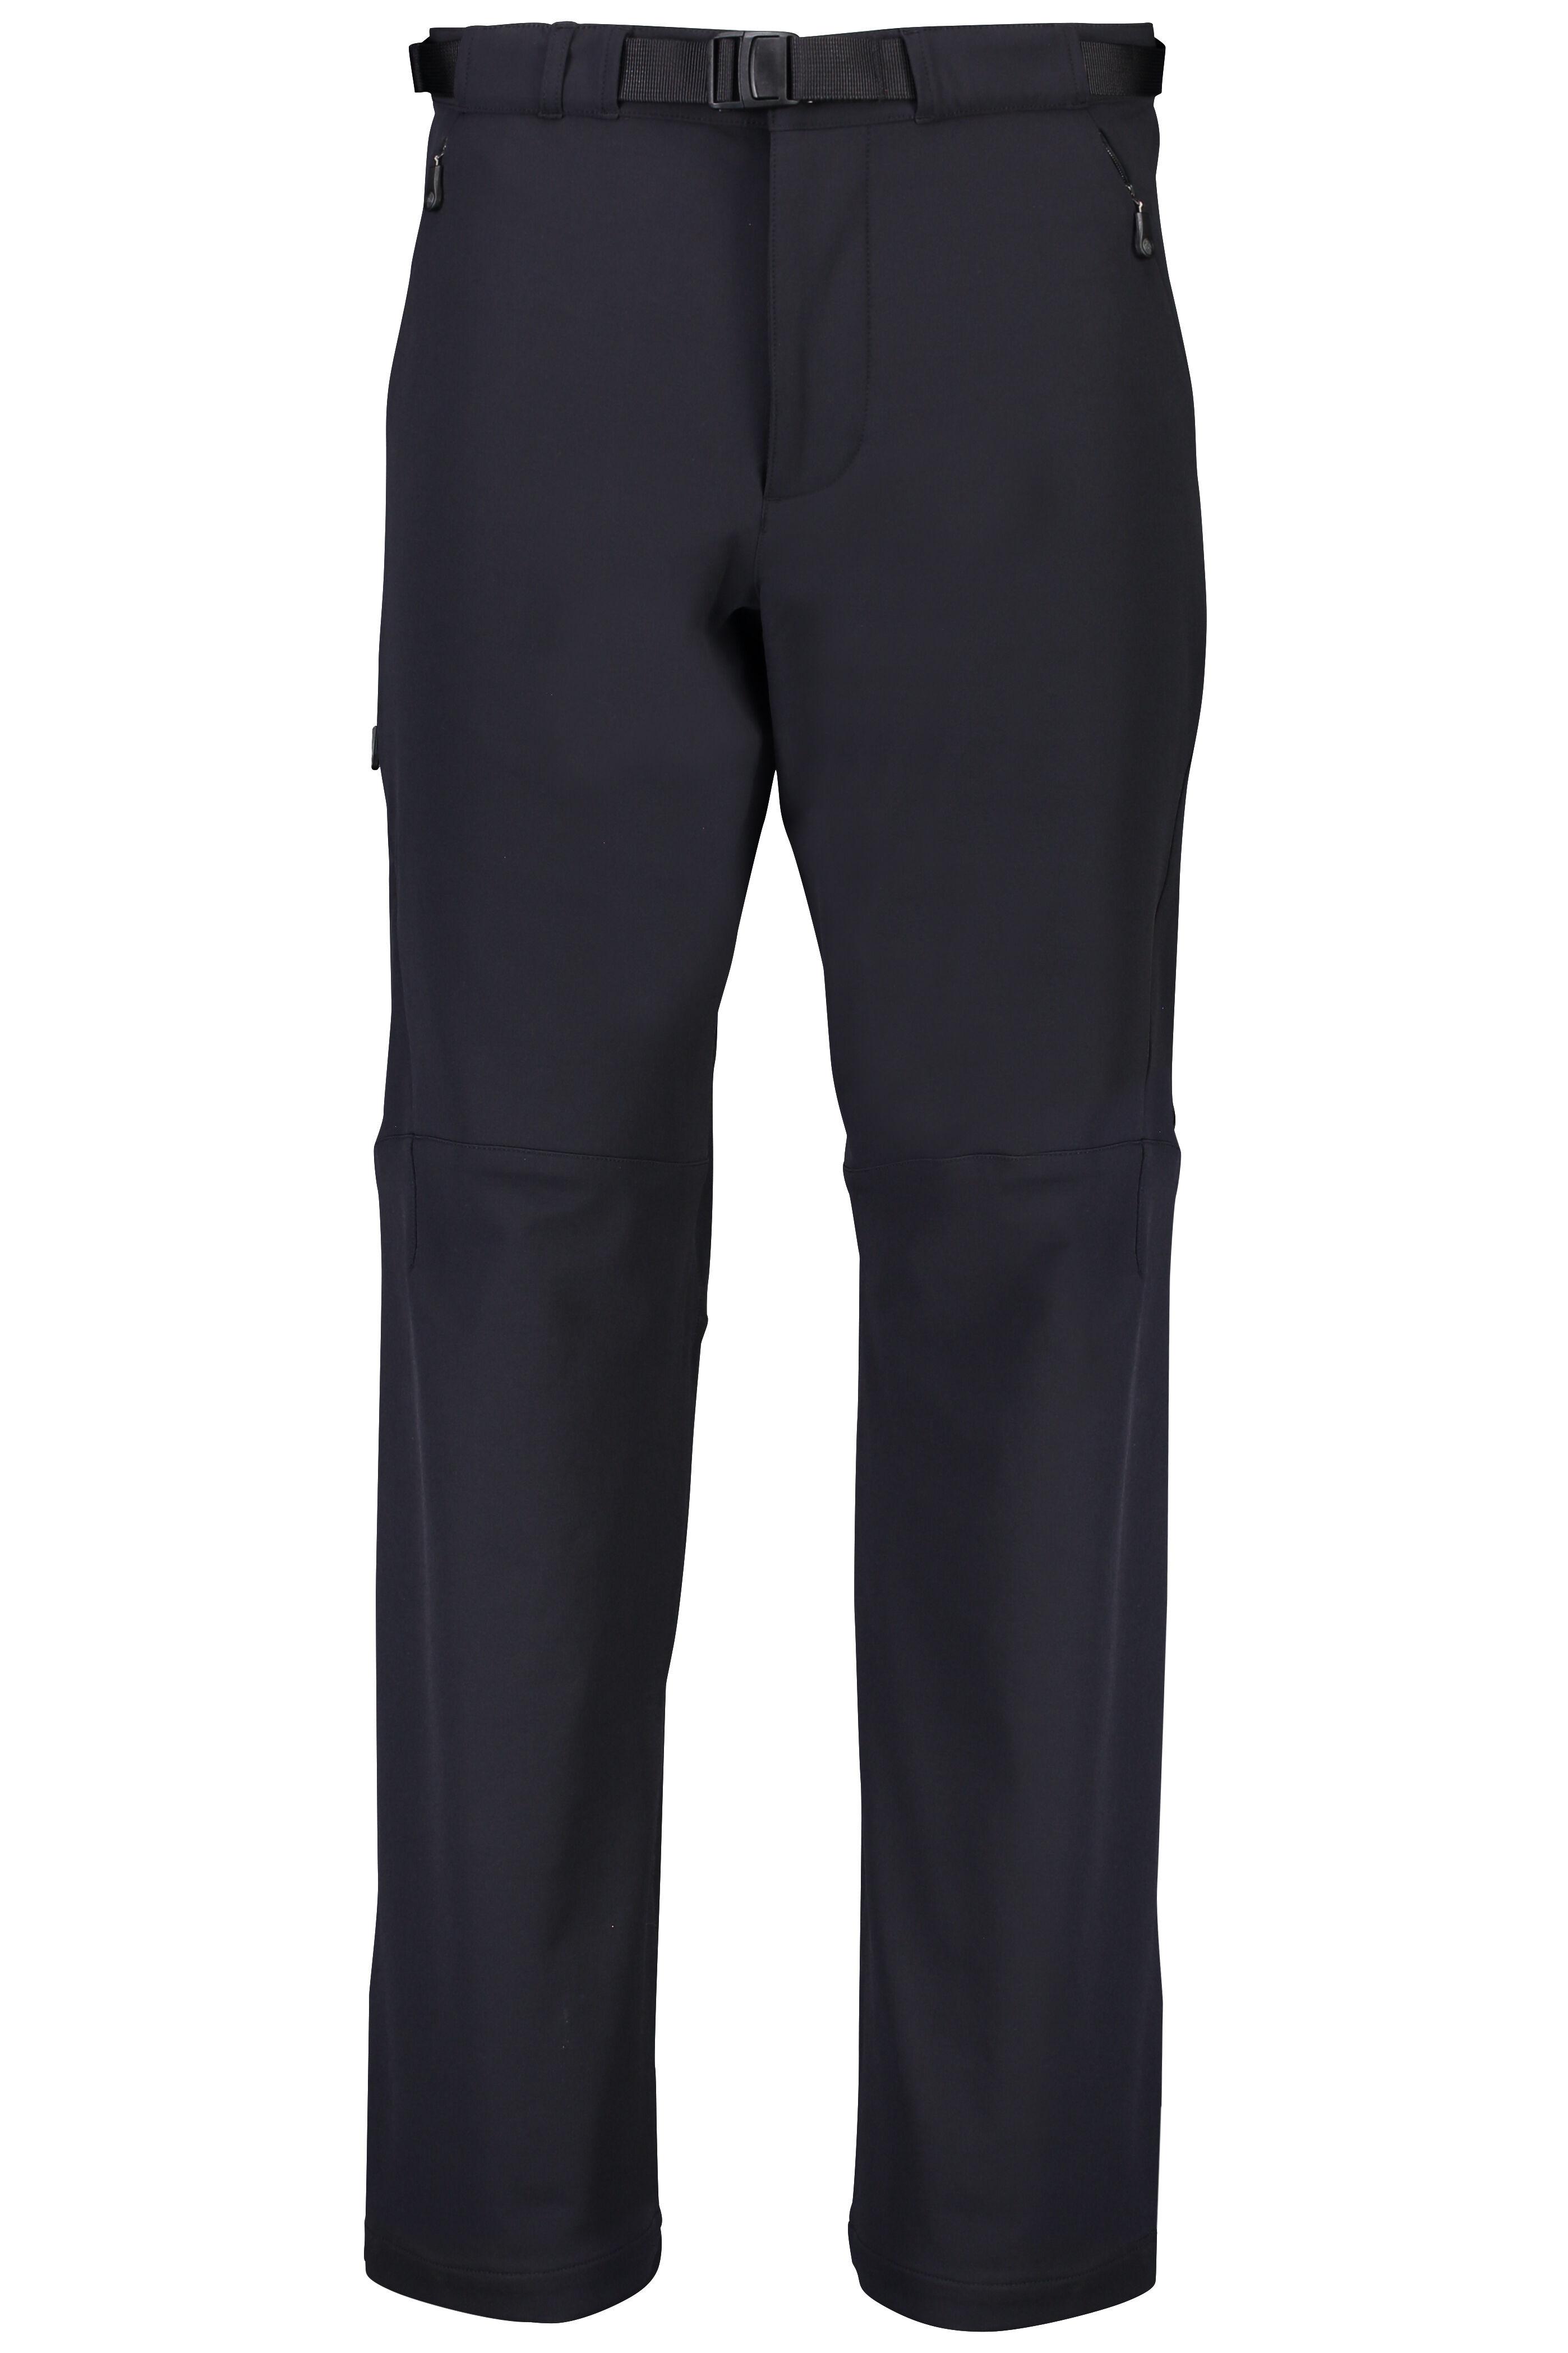 Direct Alpine Trek Pant Warm Soft Shell Trousers for Men Black